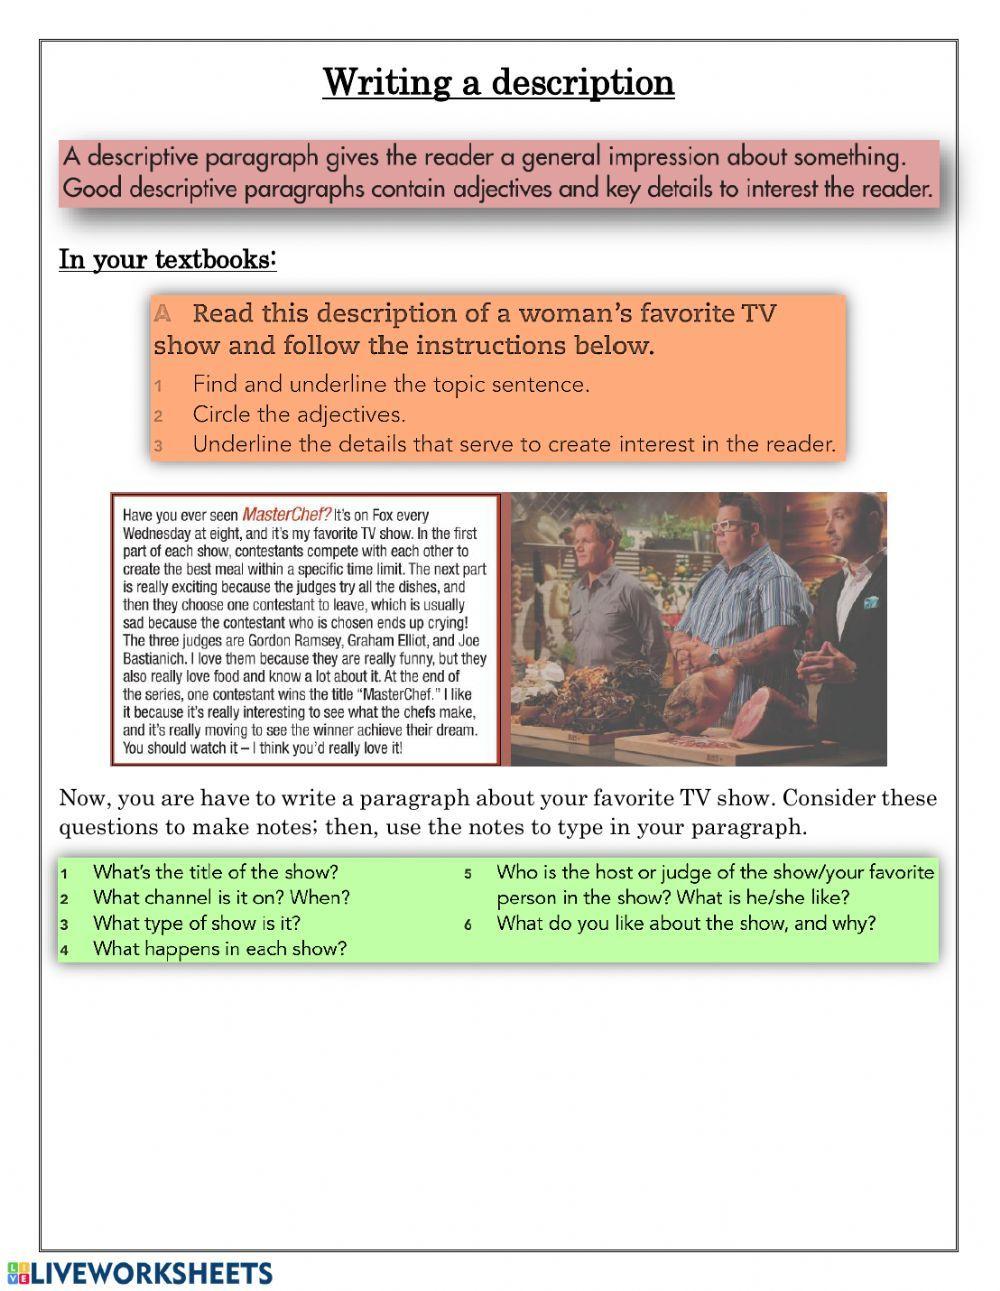 Writing a TV show description - Interactive worksheet  English as